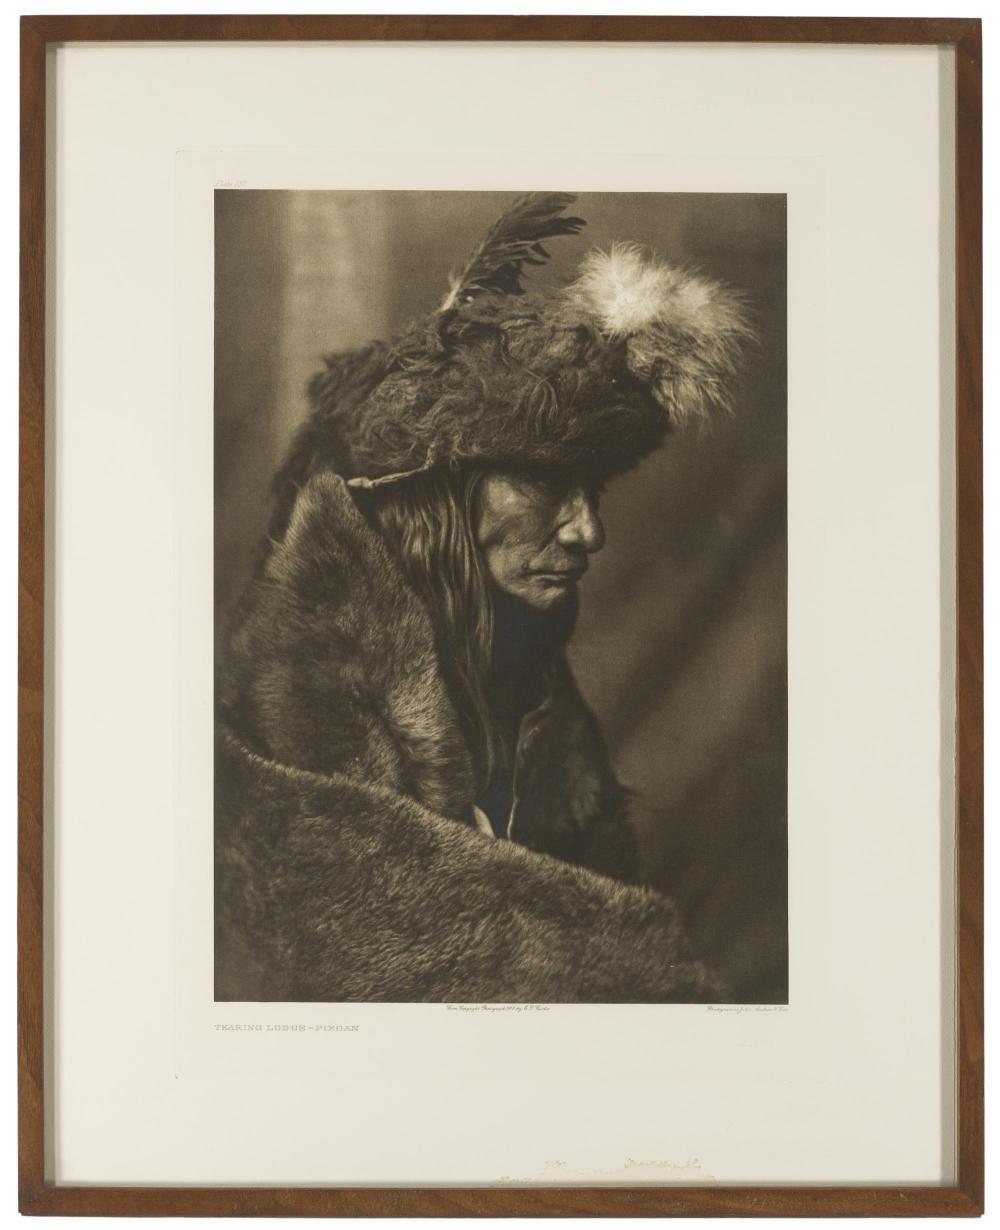 Edward S. Curtis, (1868-1952 Los Angeles, CA),